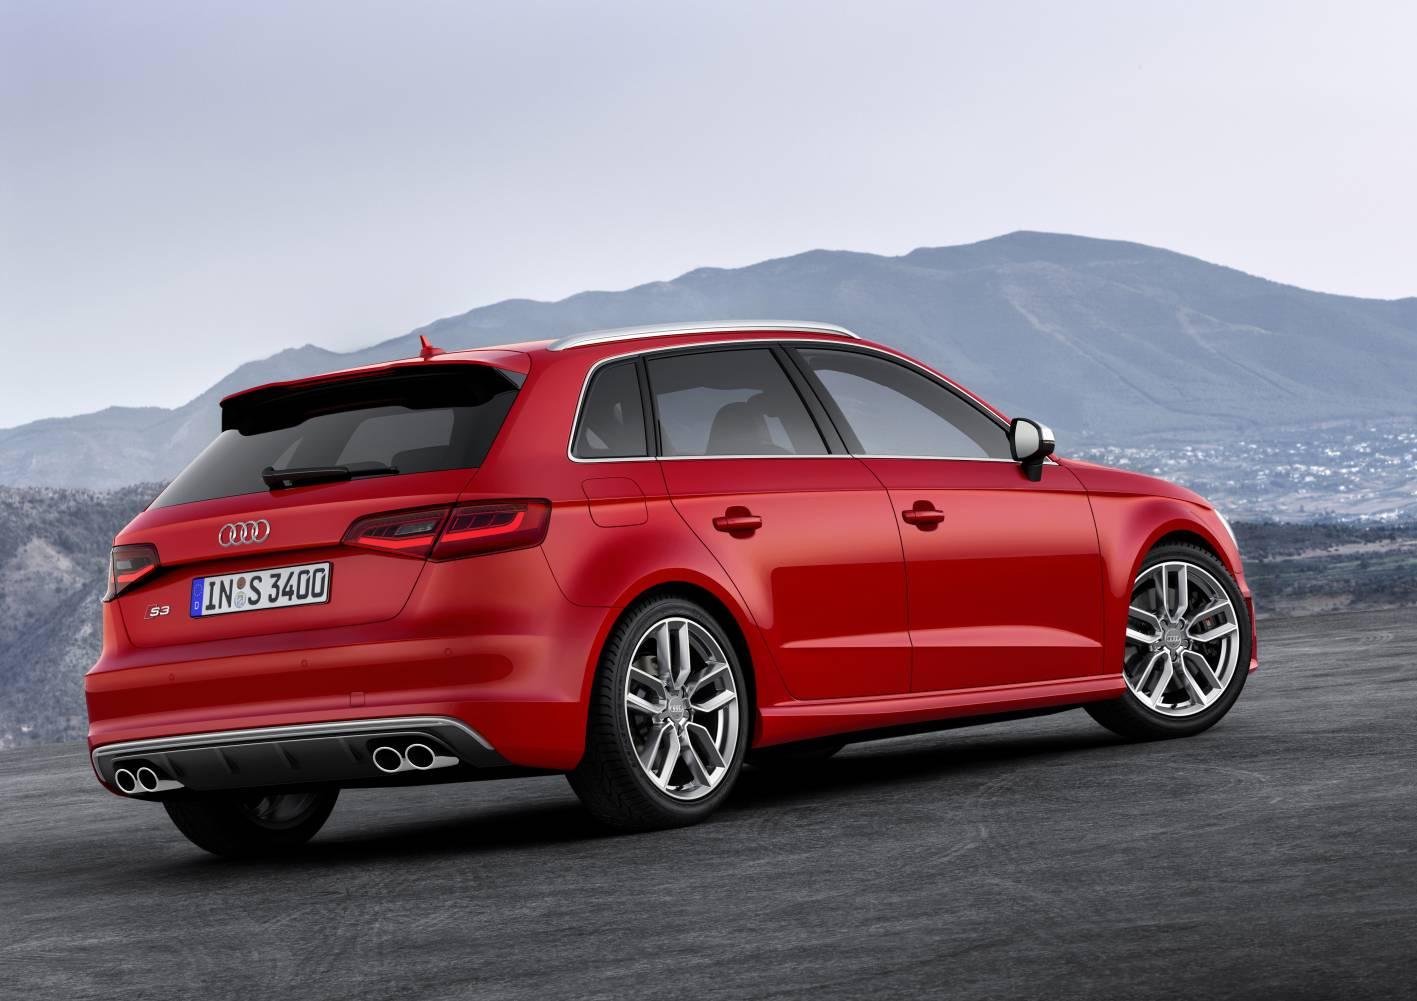 2013 Audi S3 Sportback Revealed Arriving In Australia